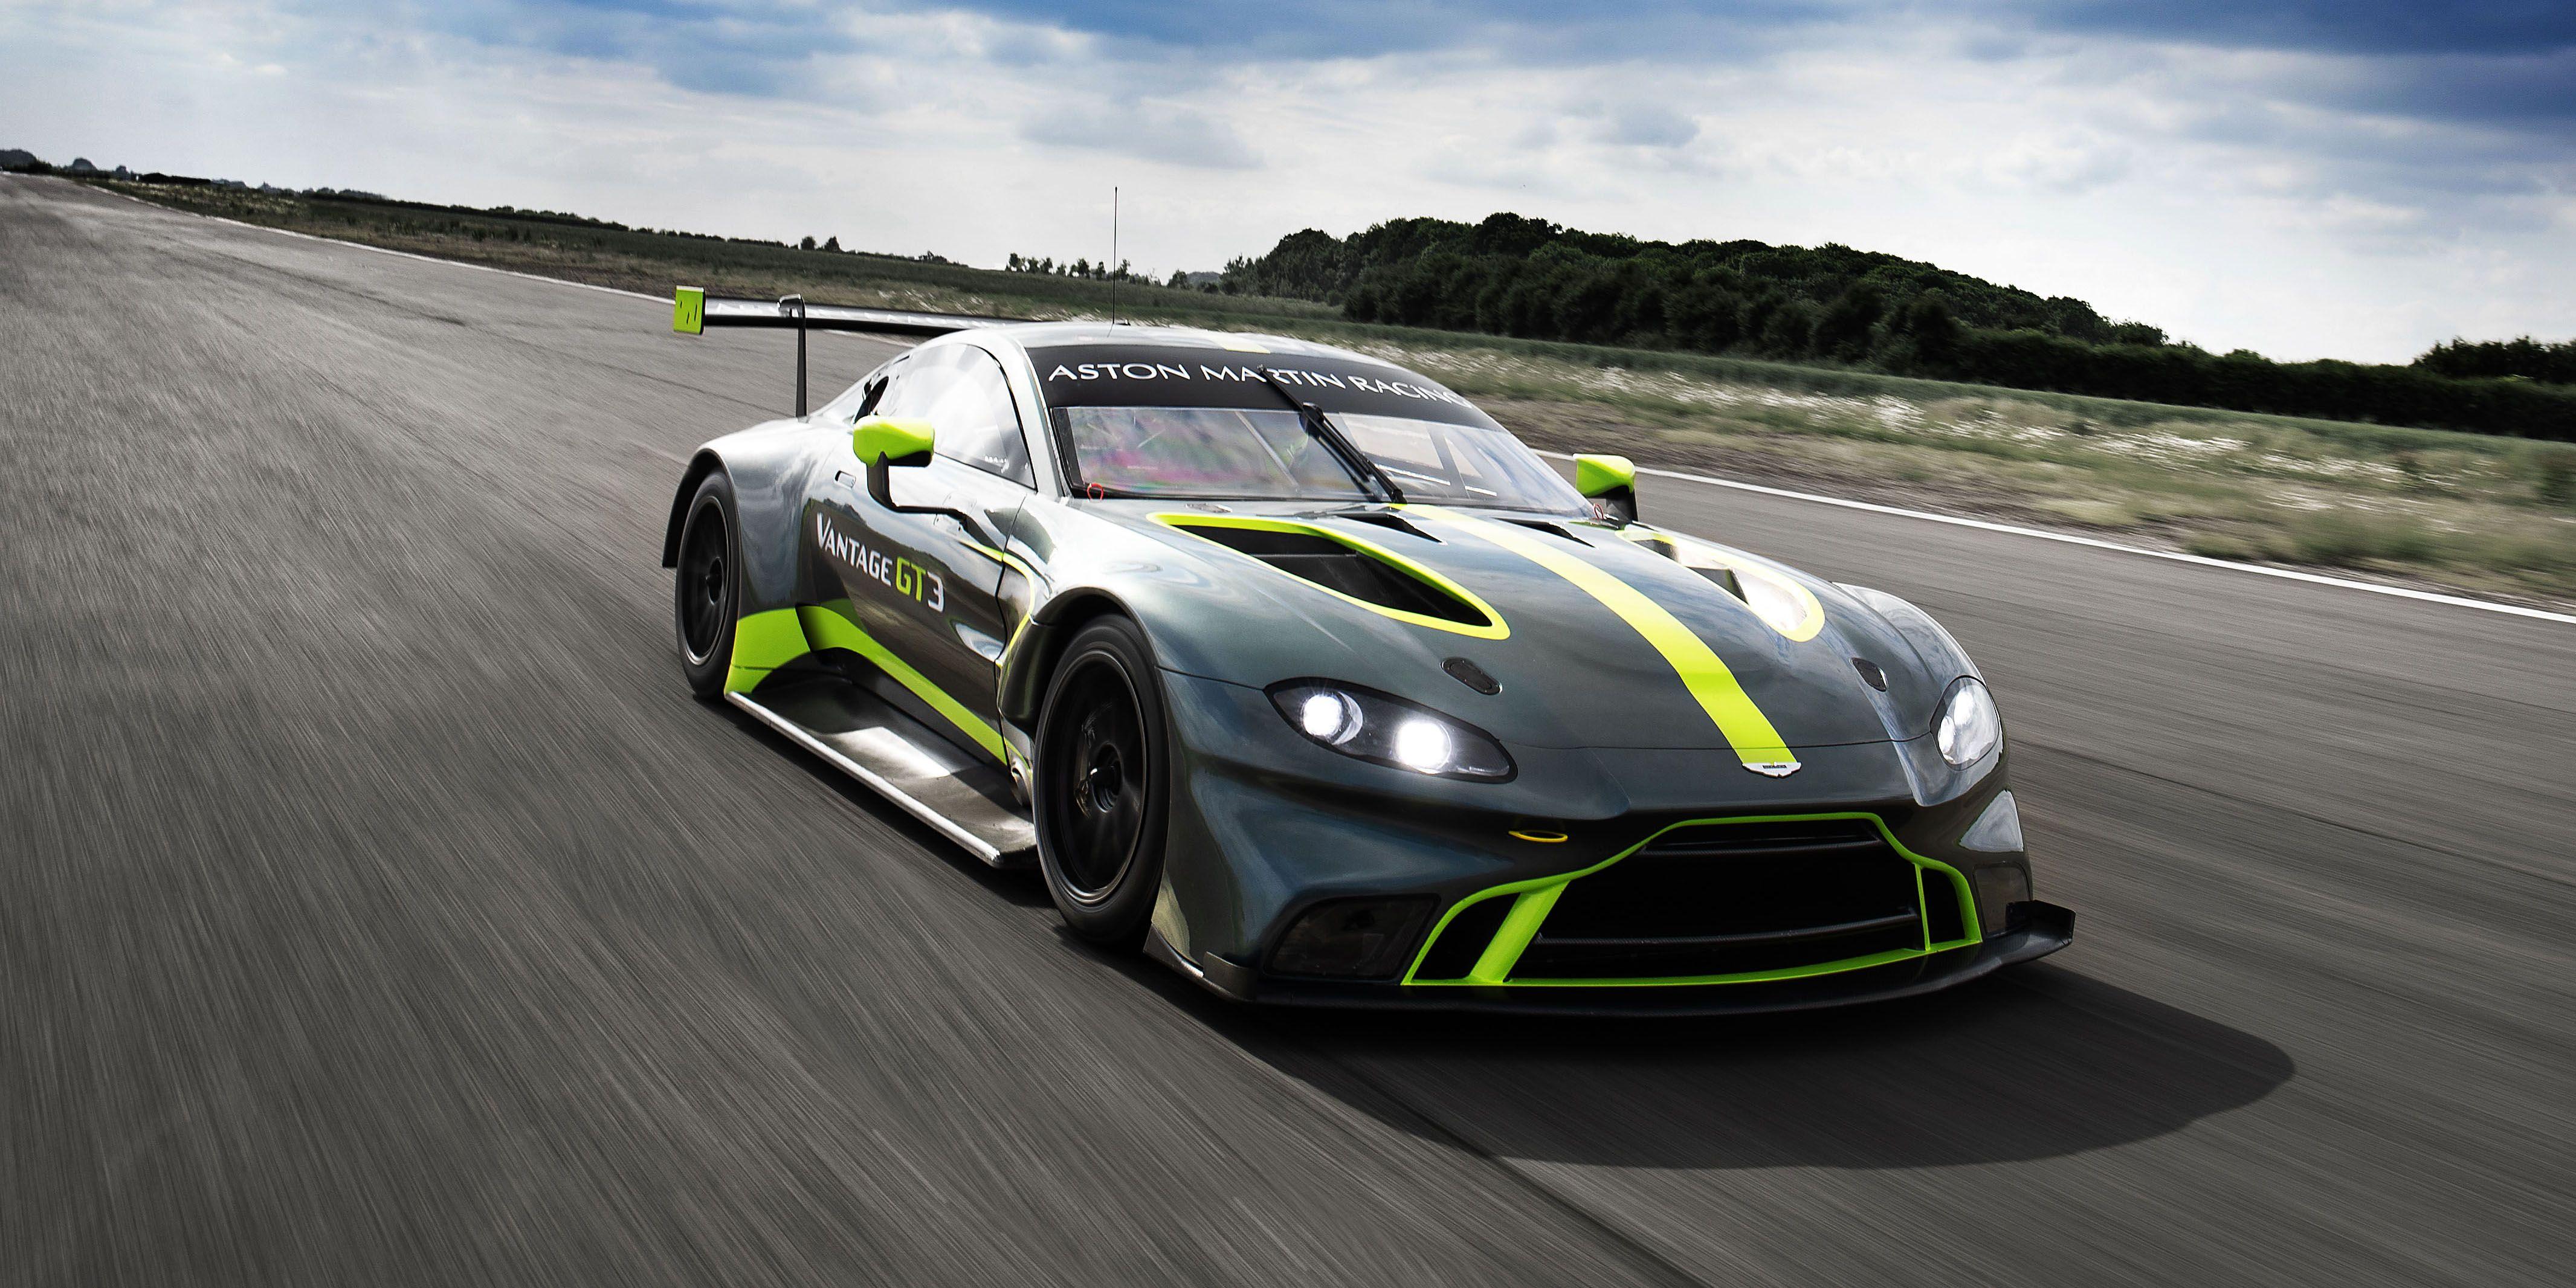 No Surprise, Aston Martin's New Race Cars are Wonderful